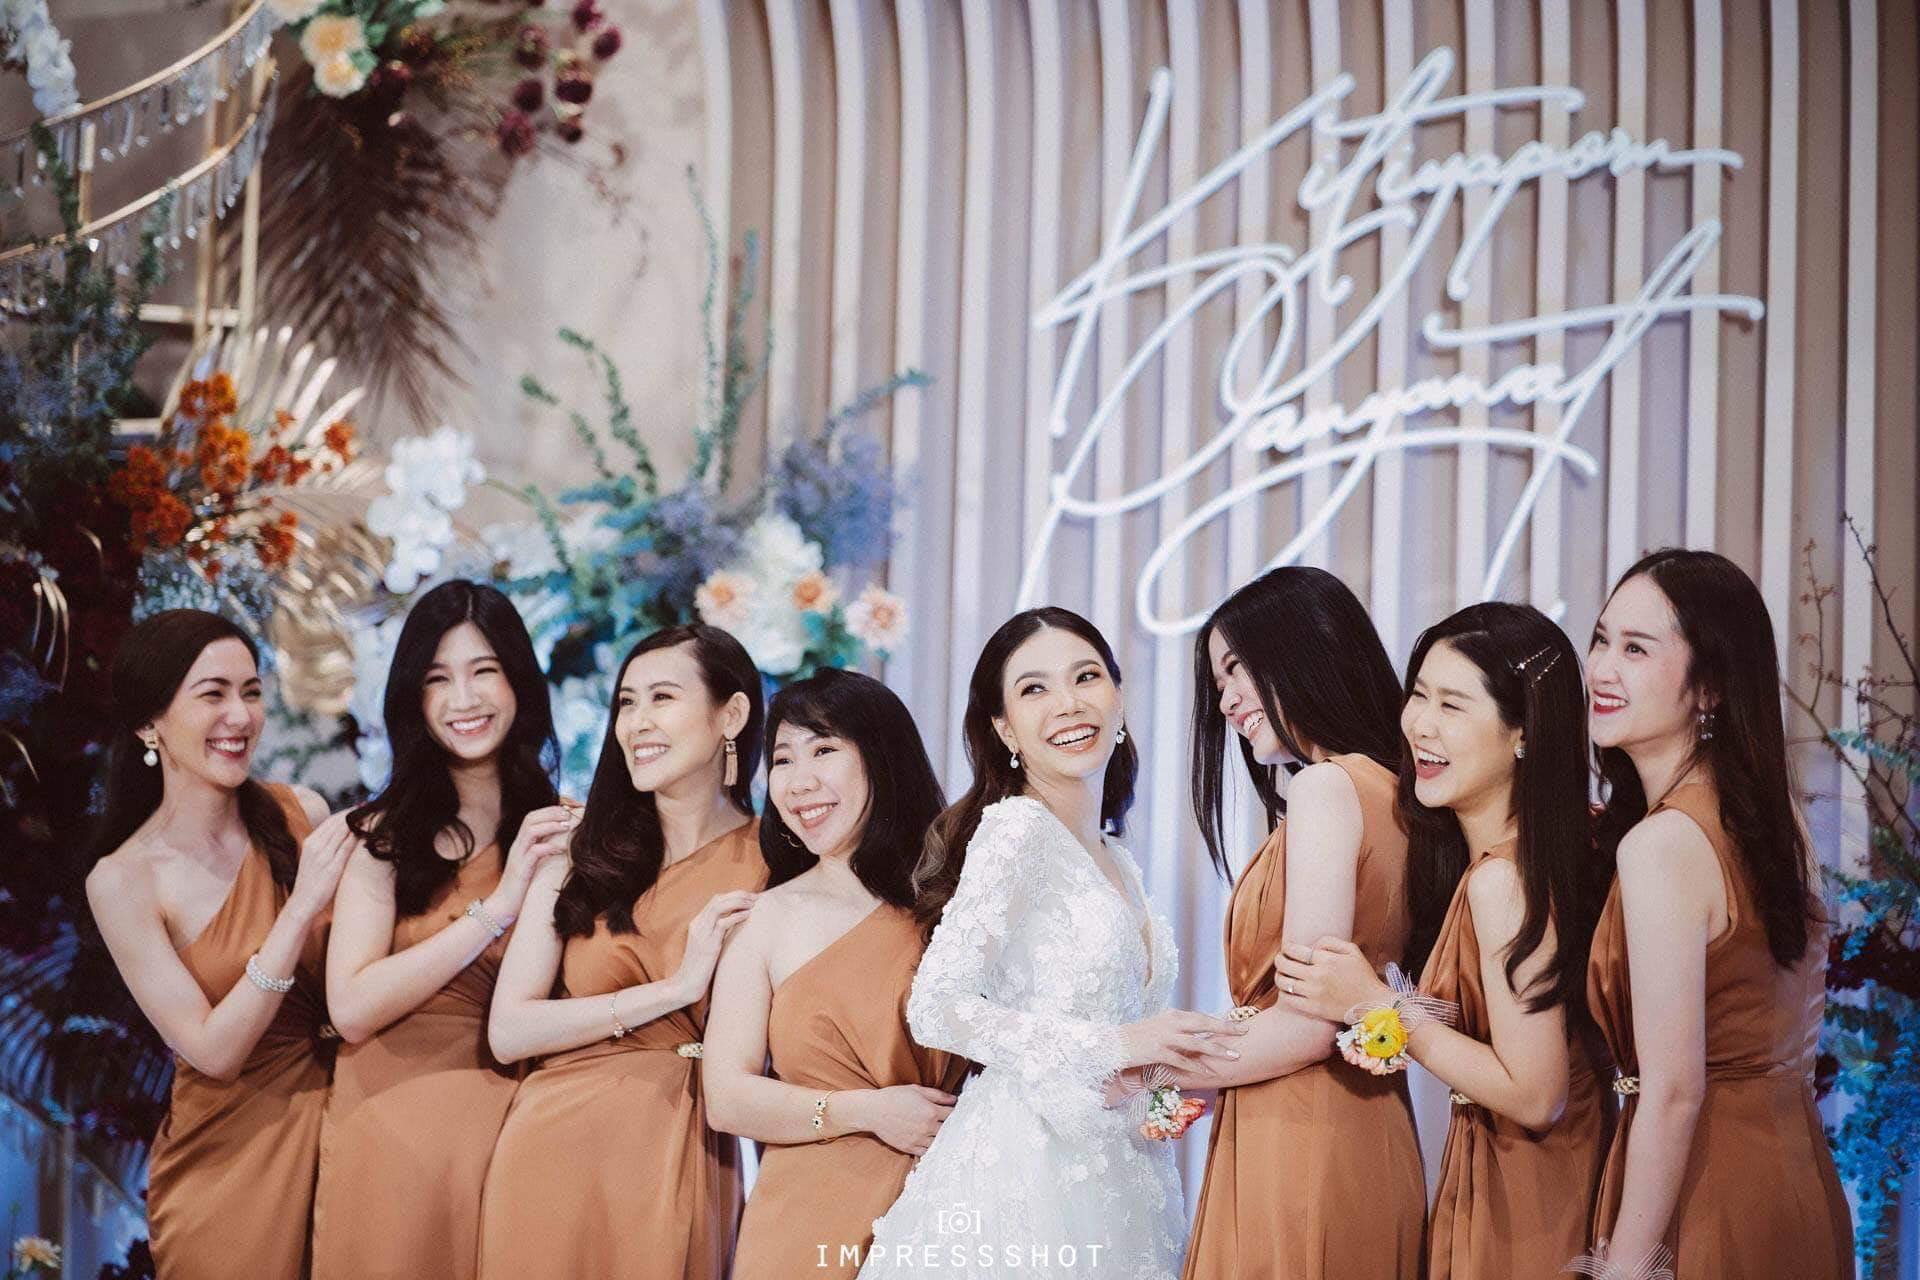 undefined จัดเต็มโปรเด็ด กับงาน Seethrough Gang Up ครั้งที่ 11สุมหัวตัวท็อปวงการ Wedding